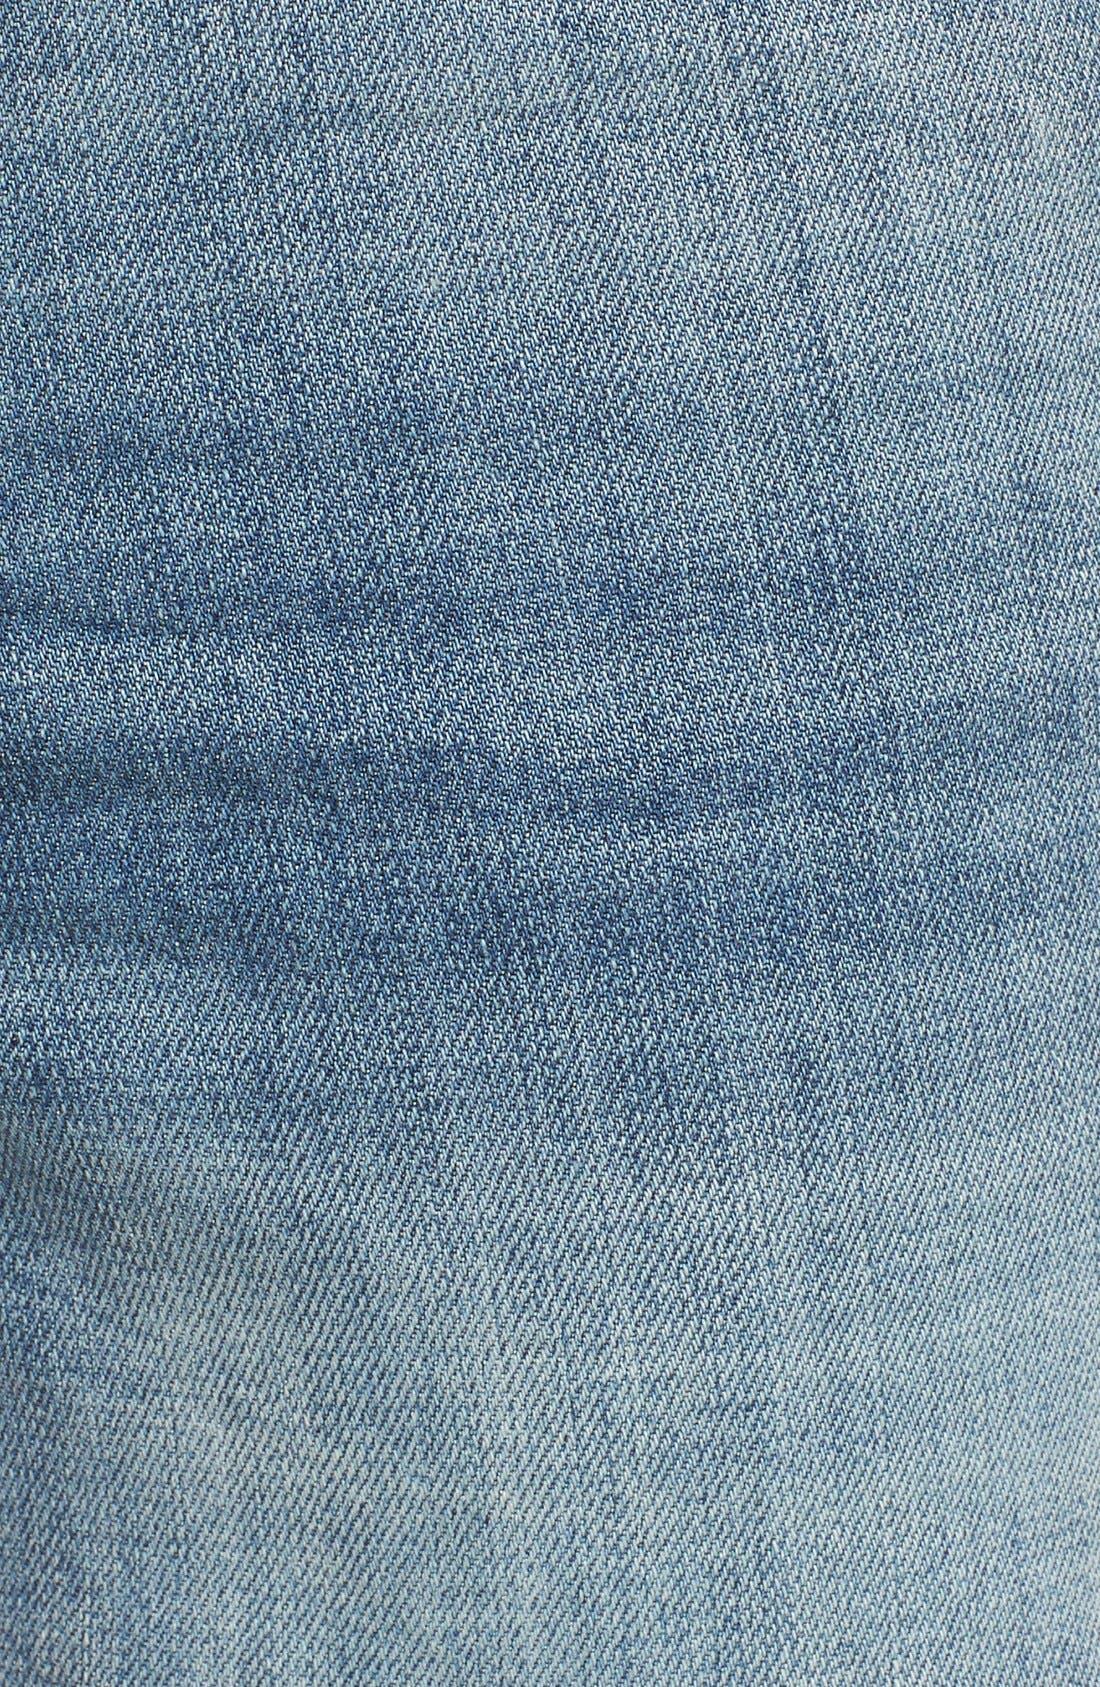 Alternate Image 5  - KUT from the Kloth 'Gidget' Denim Cutoff Shorts